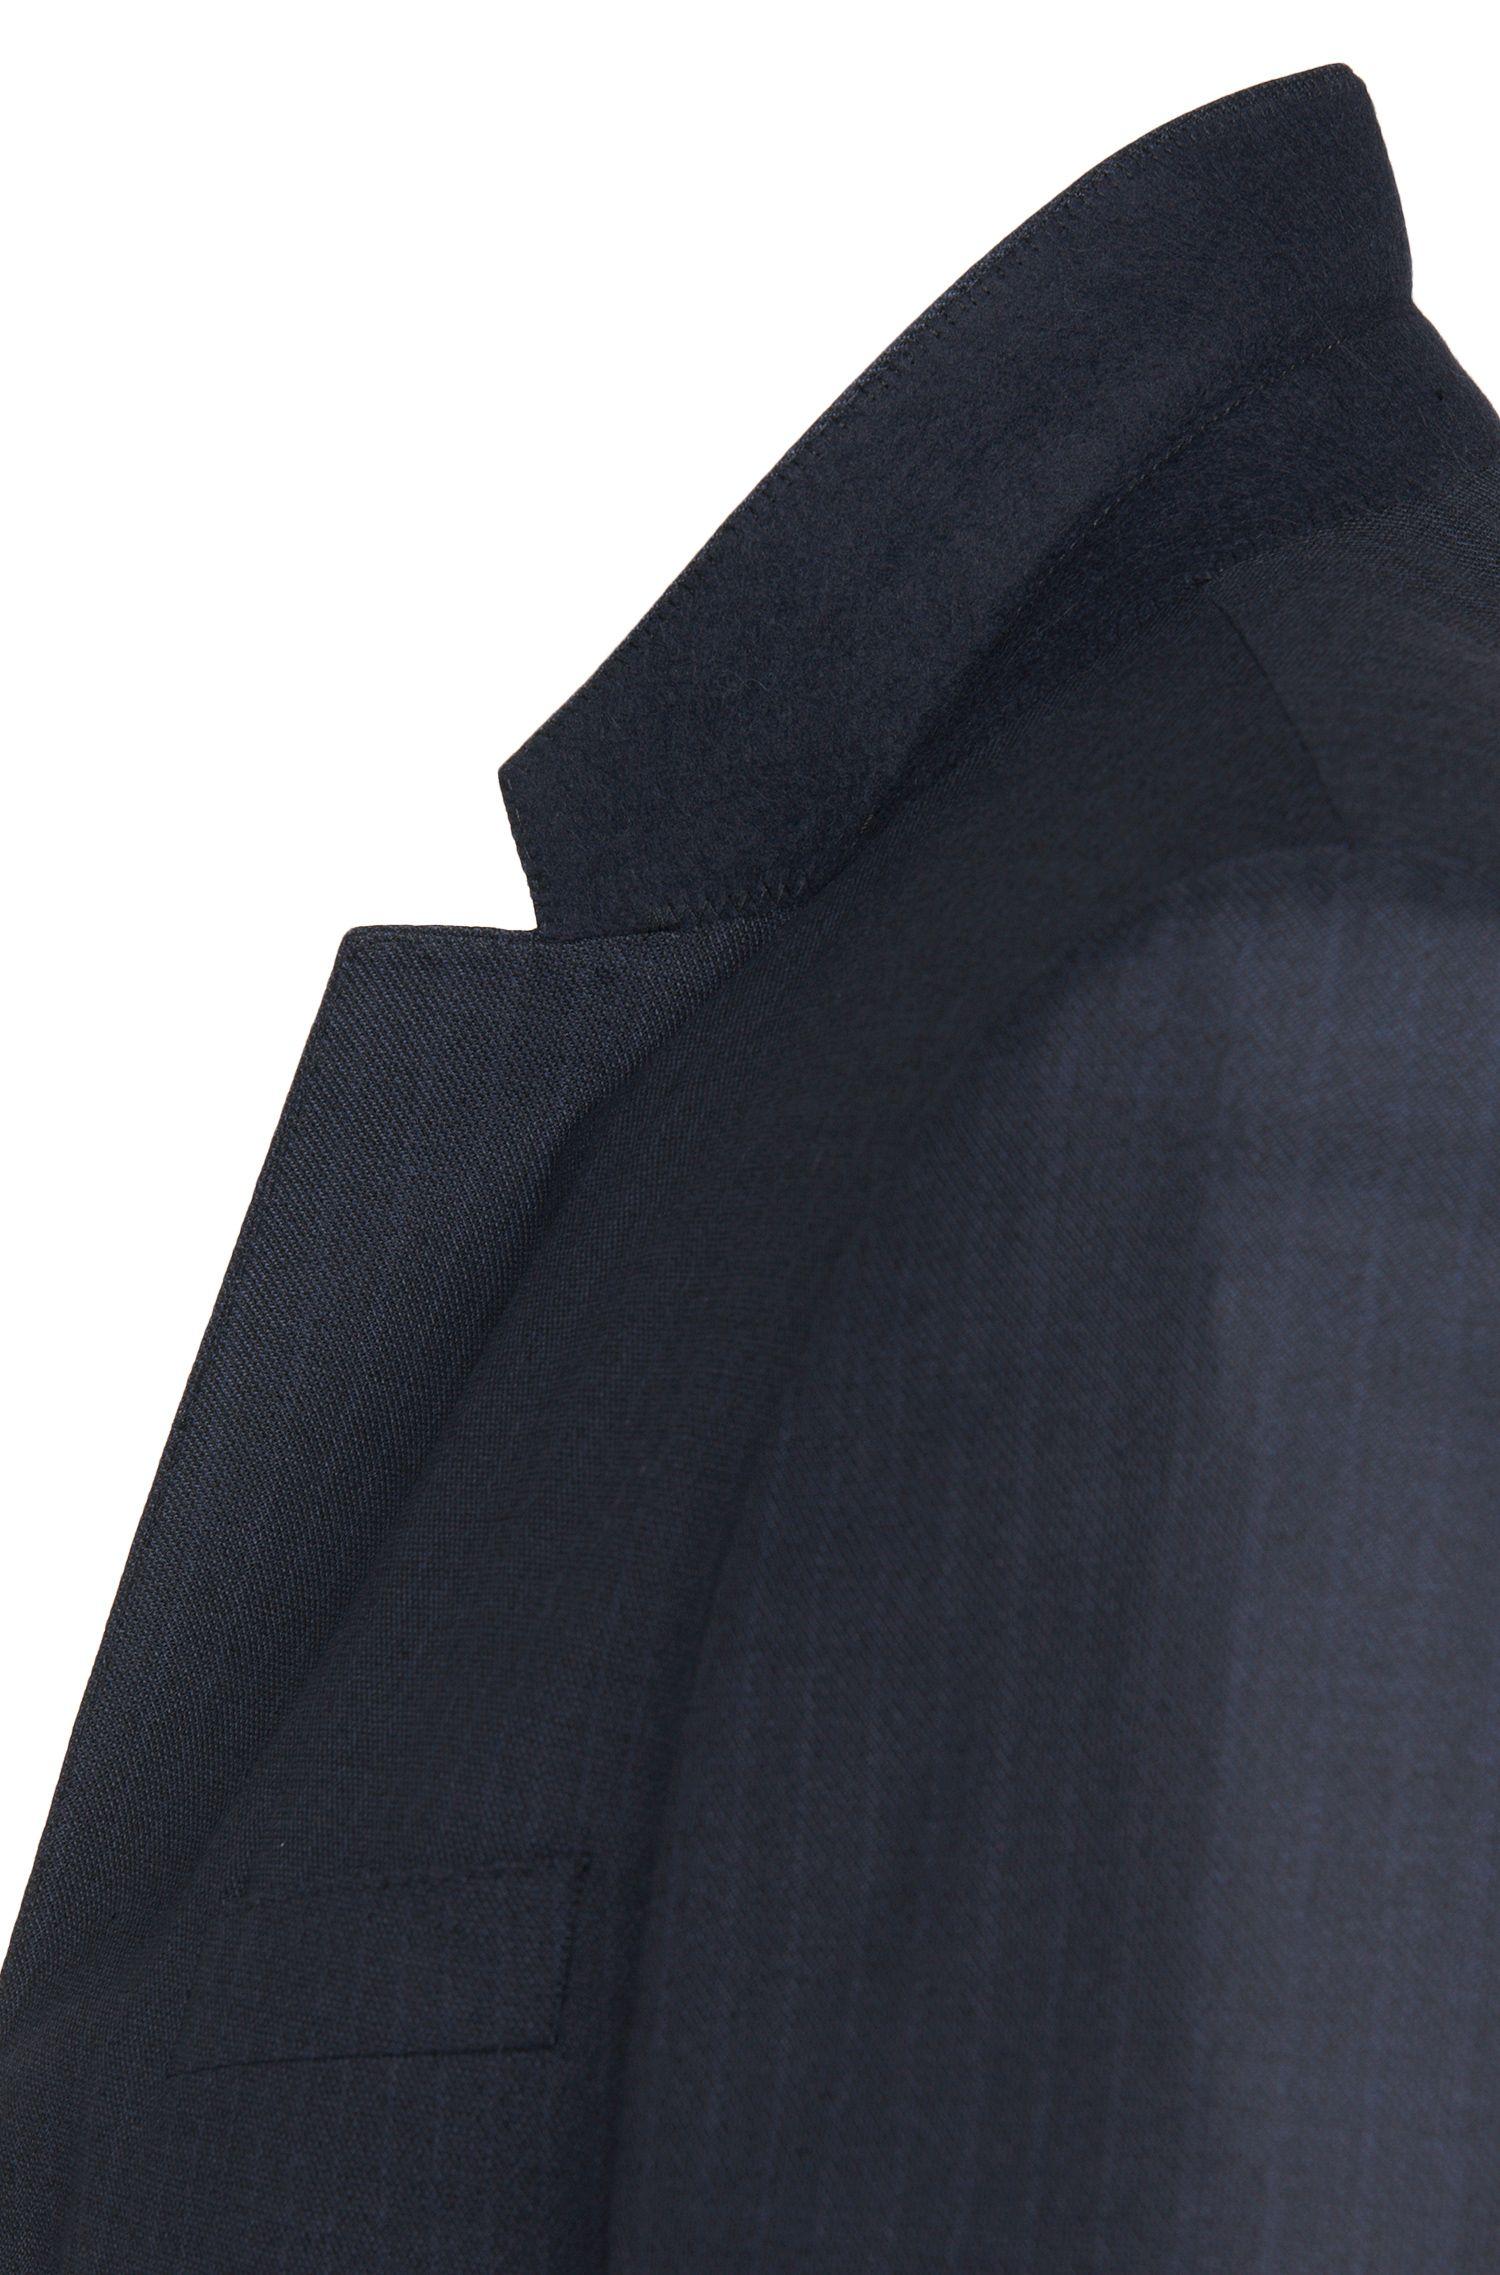 Slim-Fit Anzug aus Schurwoll-Mix mit Seide: 'Huge4/Genius3'